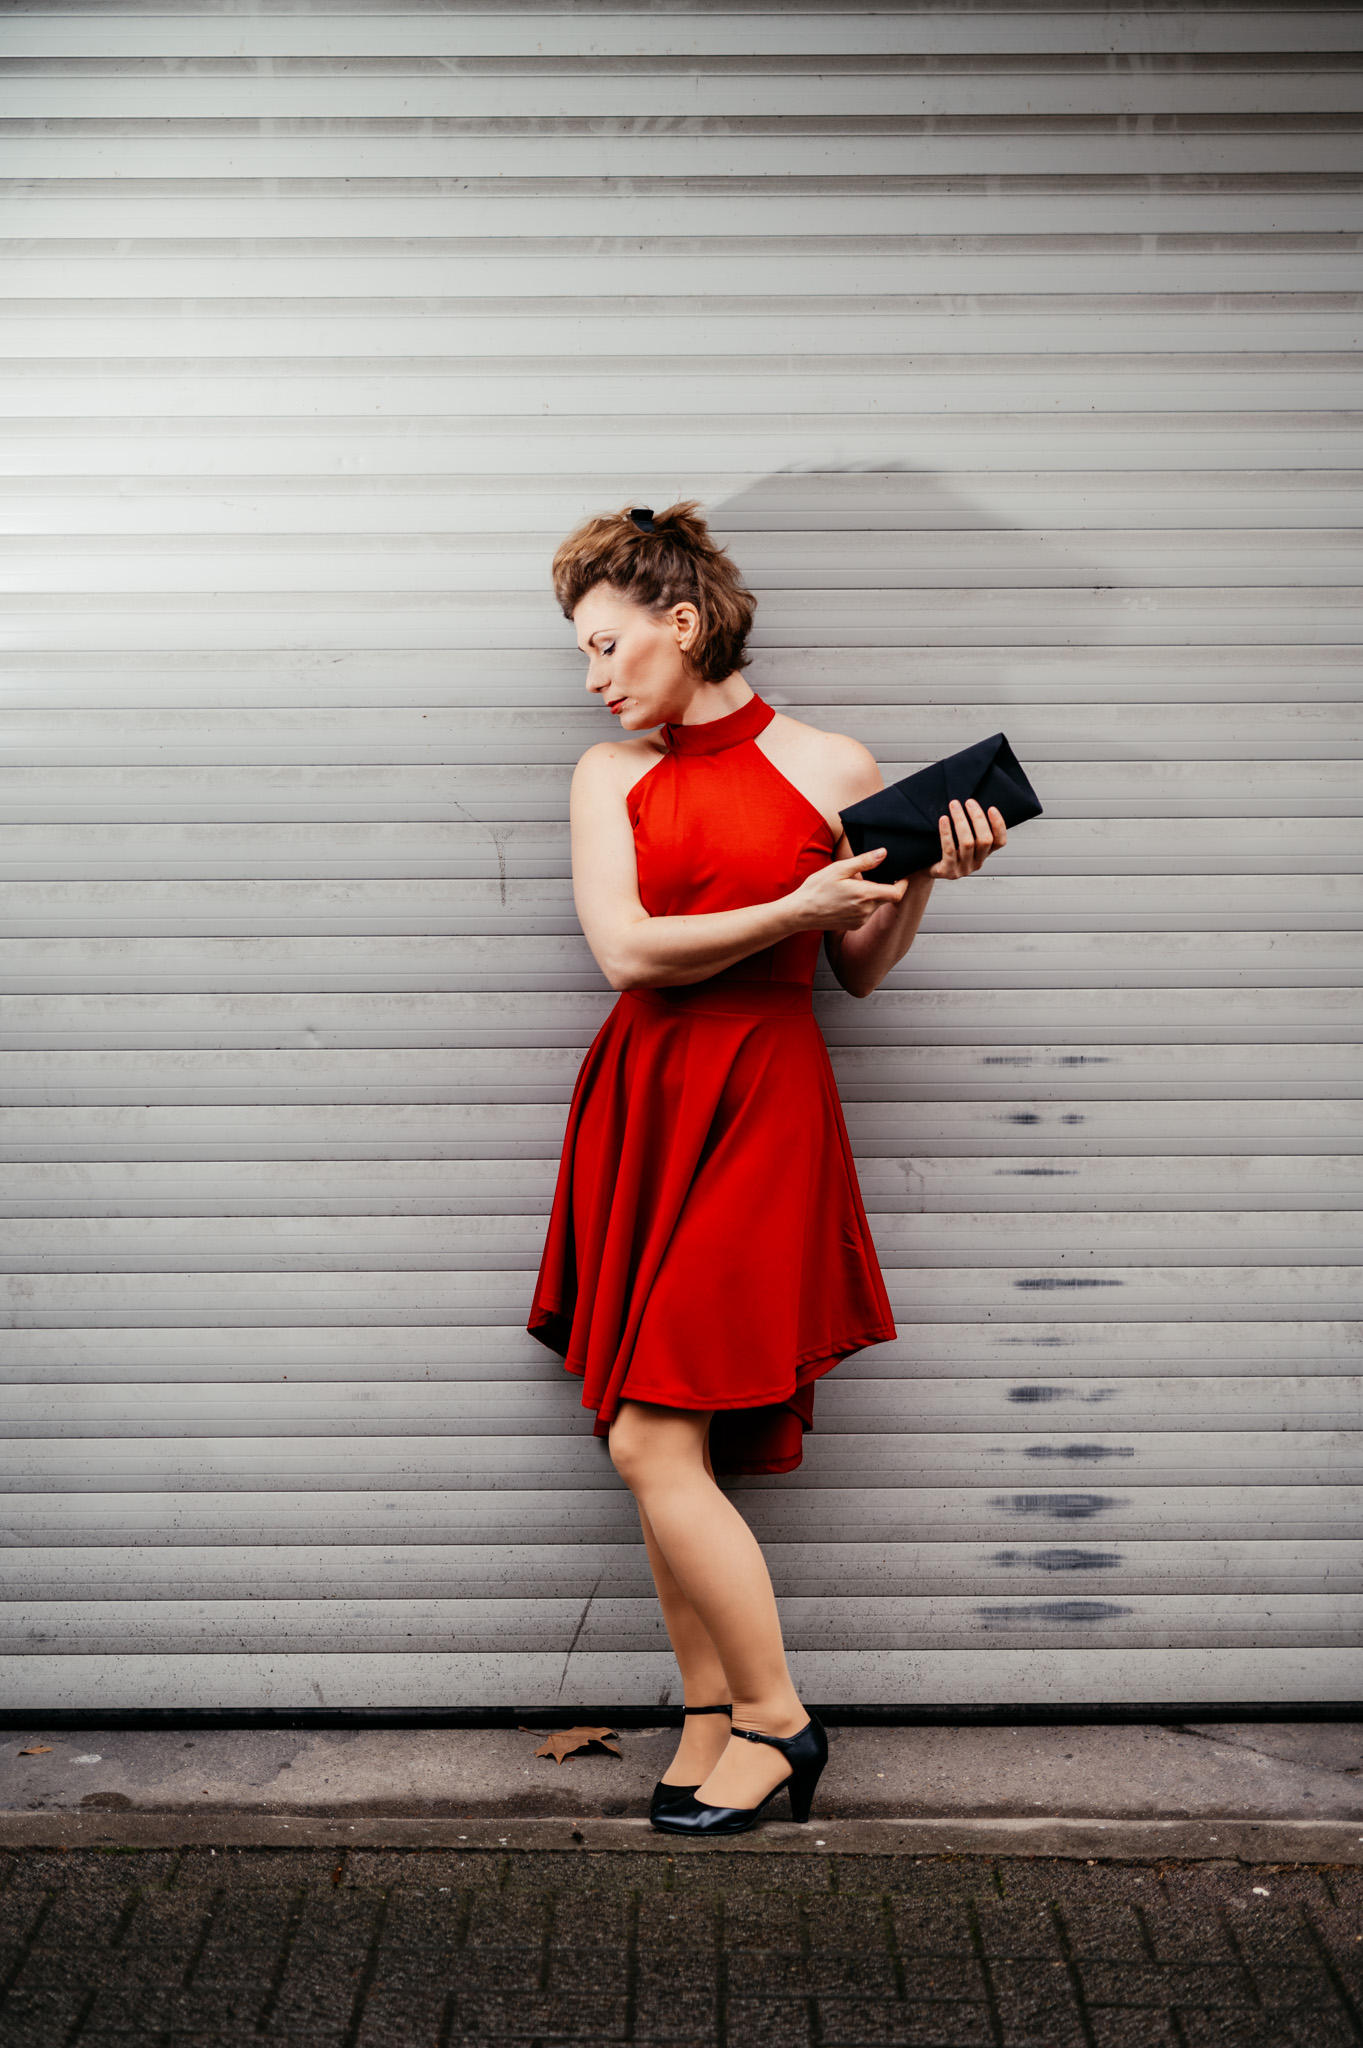 Schauspielerin Köln Bonn Sprecherin